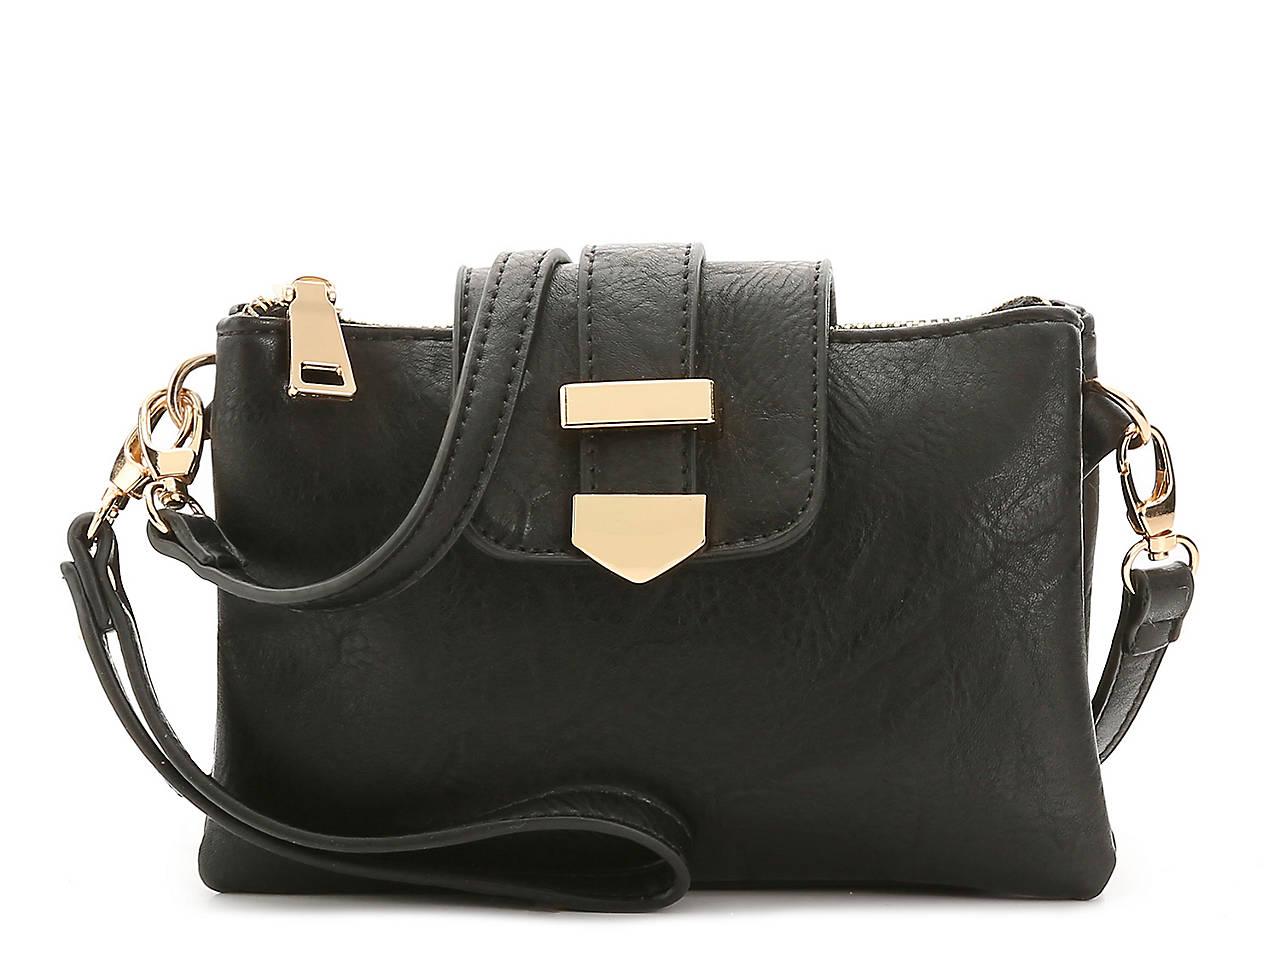 Madison West Double Gusset Crossbody Bag Women s Handbags ... 03e0ba3439